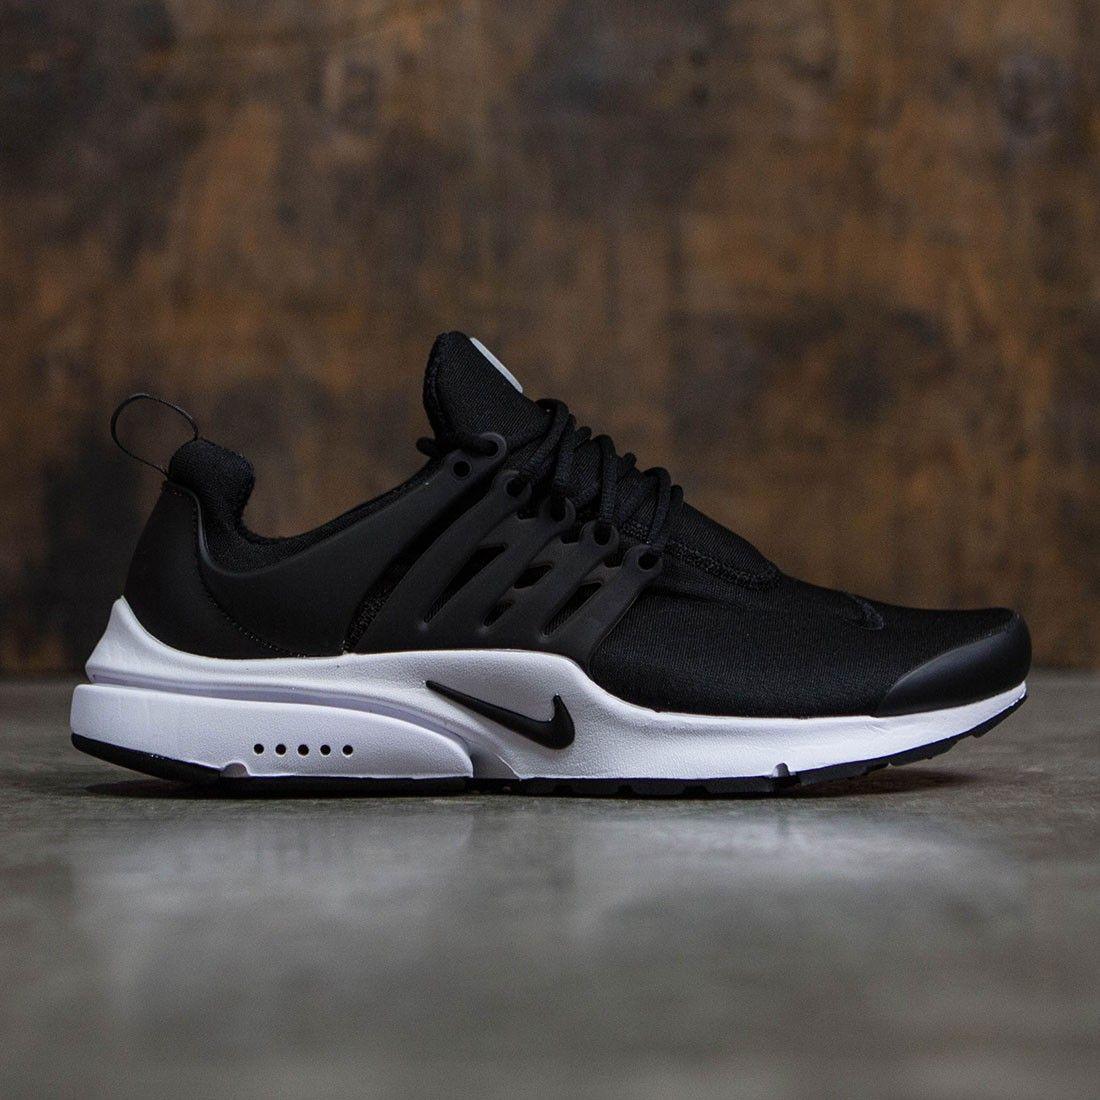 Nike Men Air Presto Essential Black Black White Black Nike Shoes Nike Shoes Women Fashion Hot Sneakers